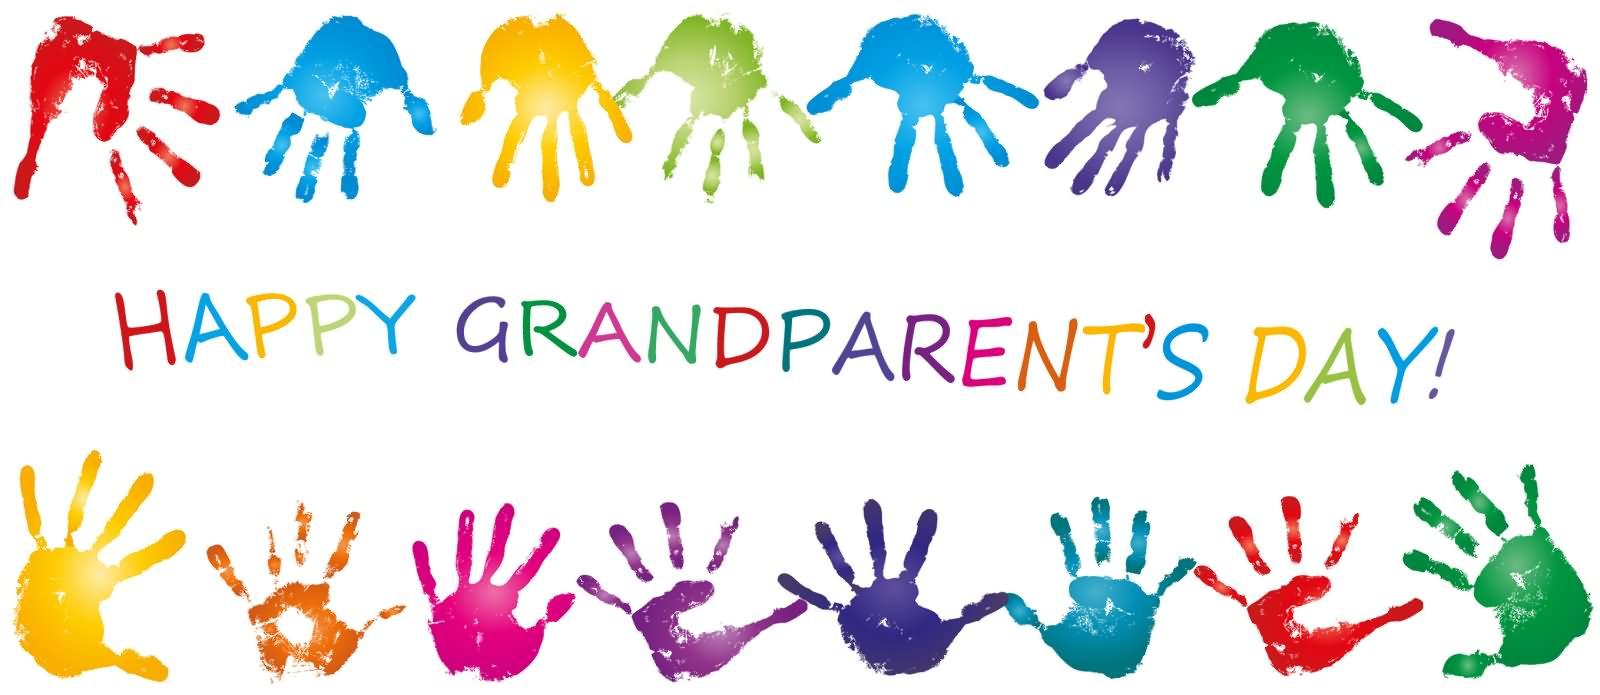 Happy-Grandparents-Day-Colorful-Handprints-Picture